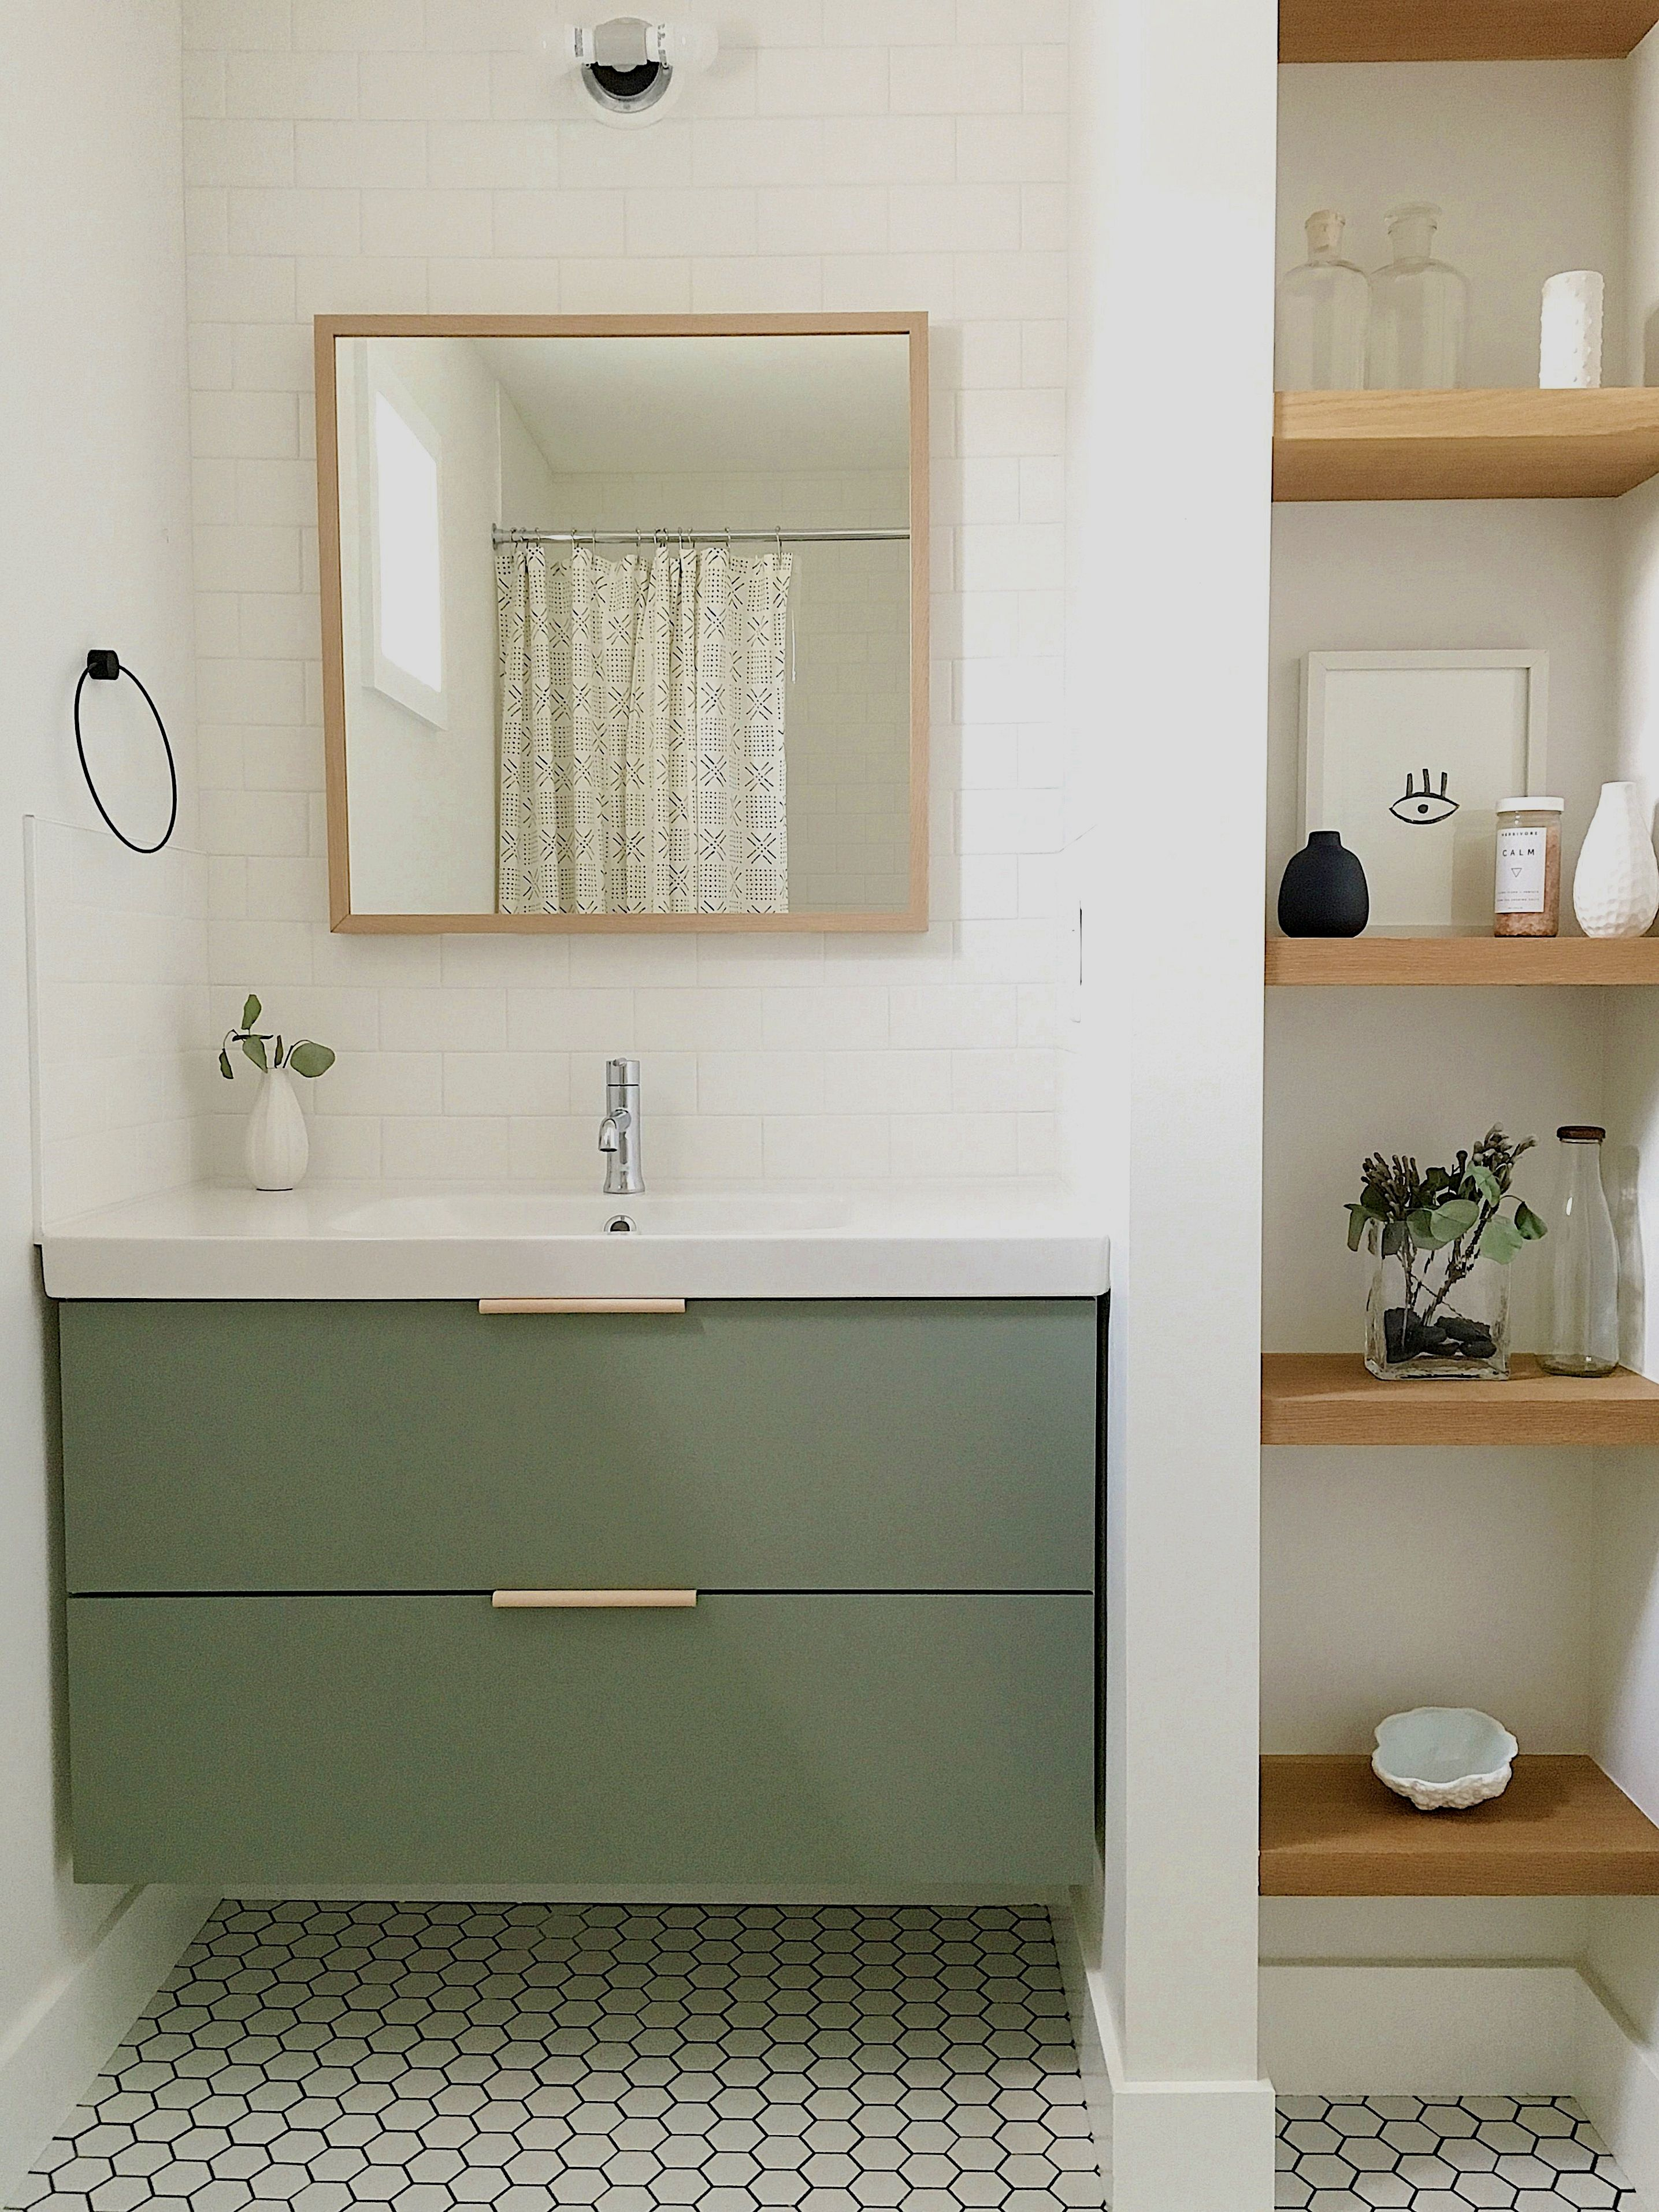 Great Bathroom Decor And Design Avec Images Idee Salle De Bain